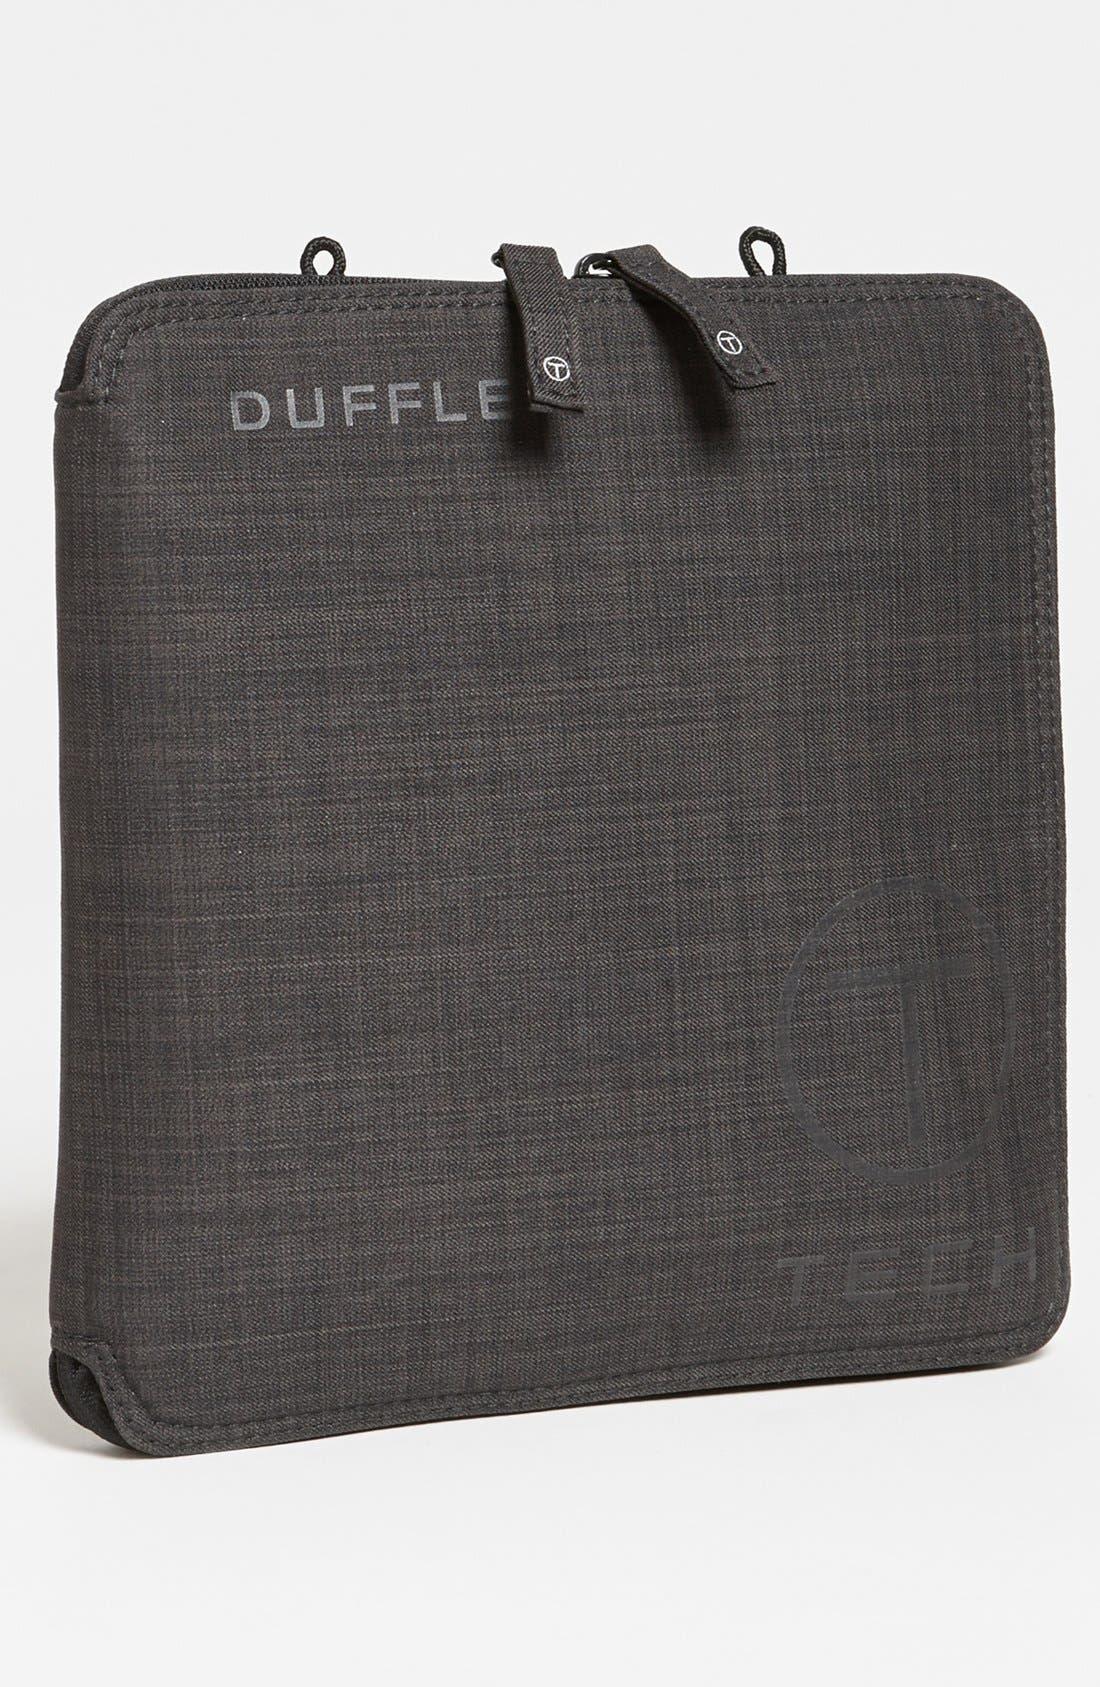 by TUMI Packable Duffel Bag,                             Alternate thumbnail 2, color,                             020